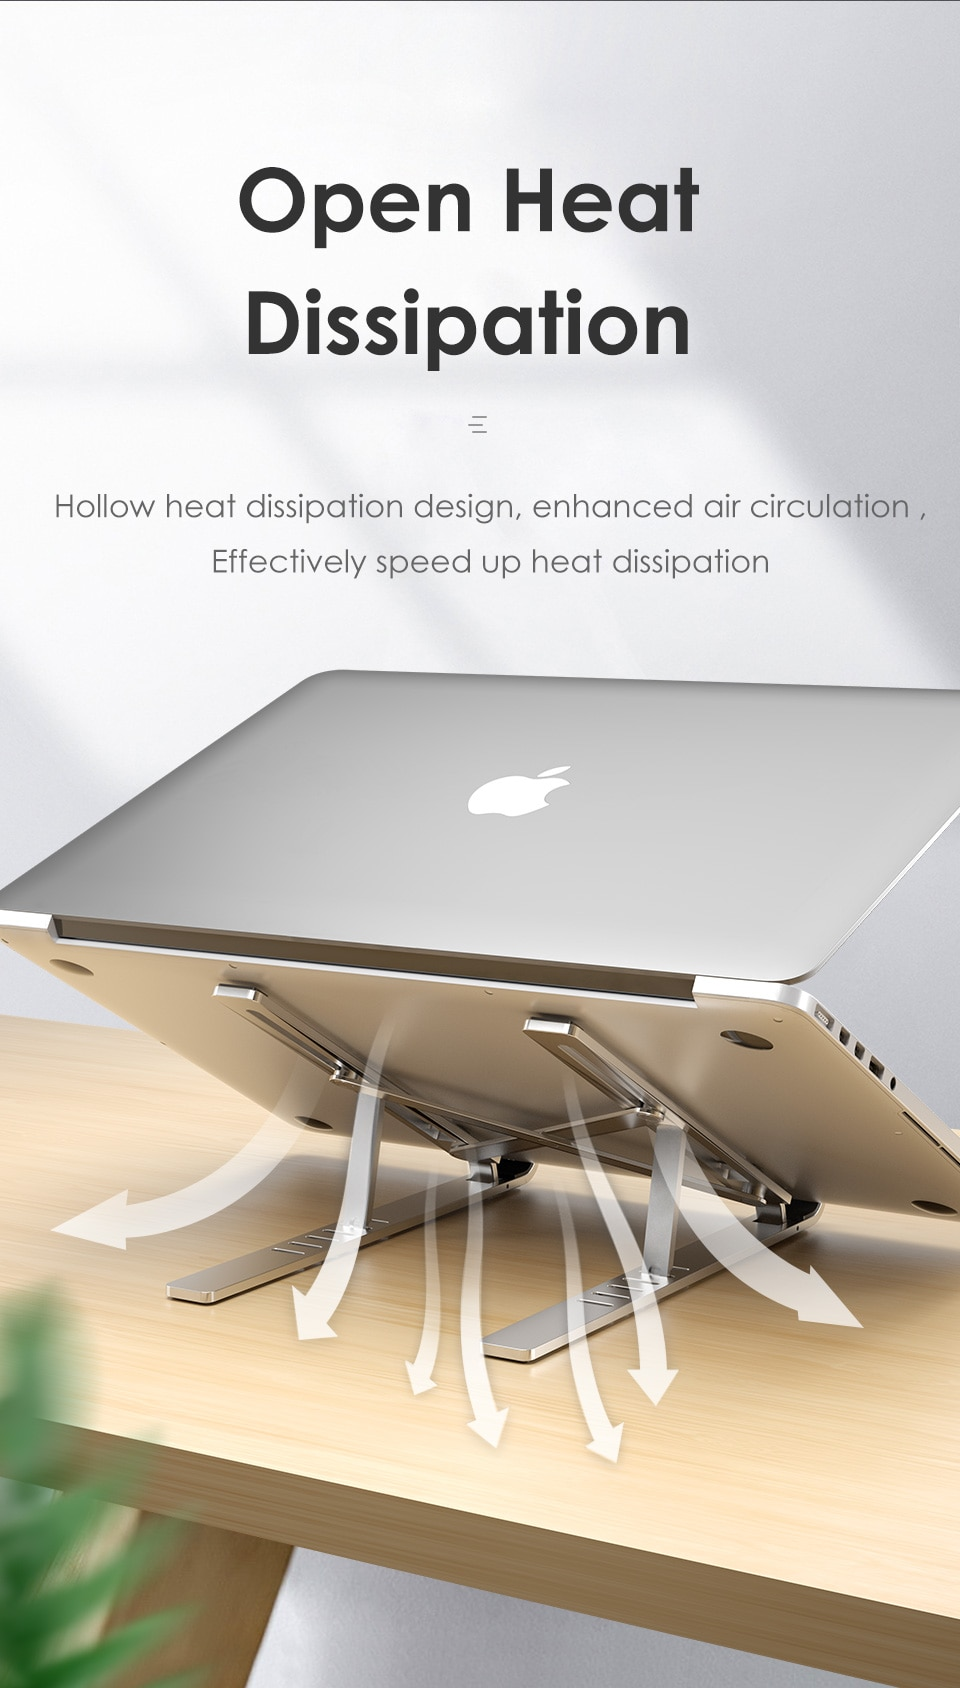 LINGCHEN Laptop Holder for MacBook Air Pro Notebook Foldable Aluminium Alloy Laptop Stand Bracket Laptop Holder for PC Notebook